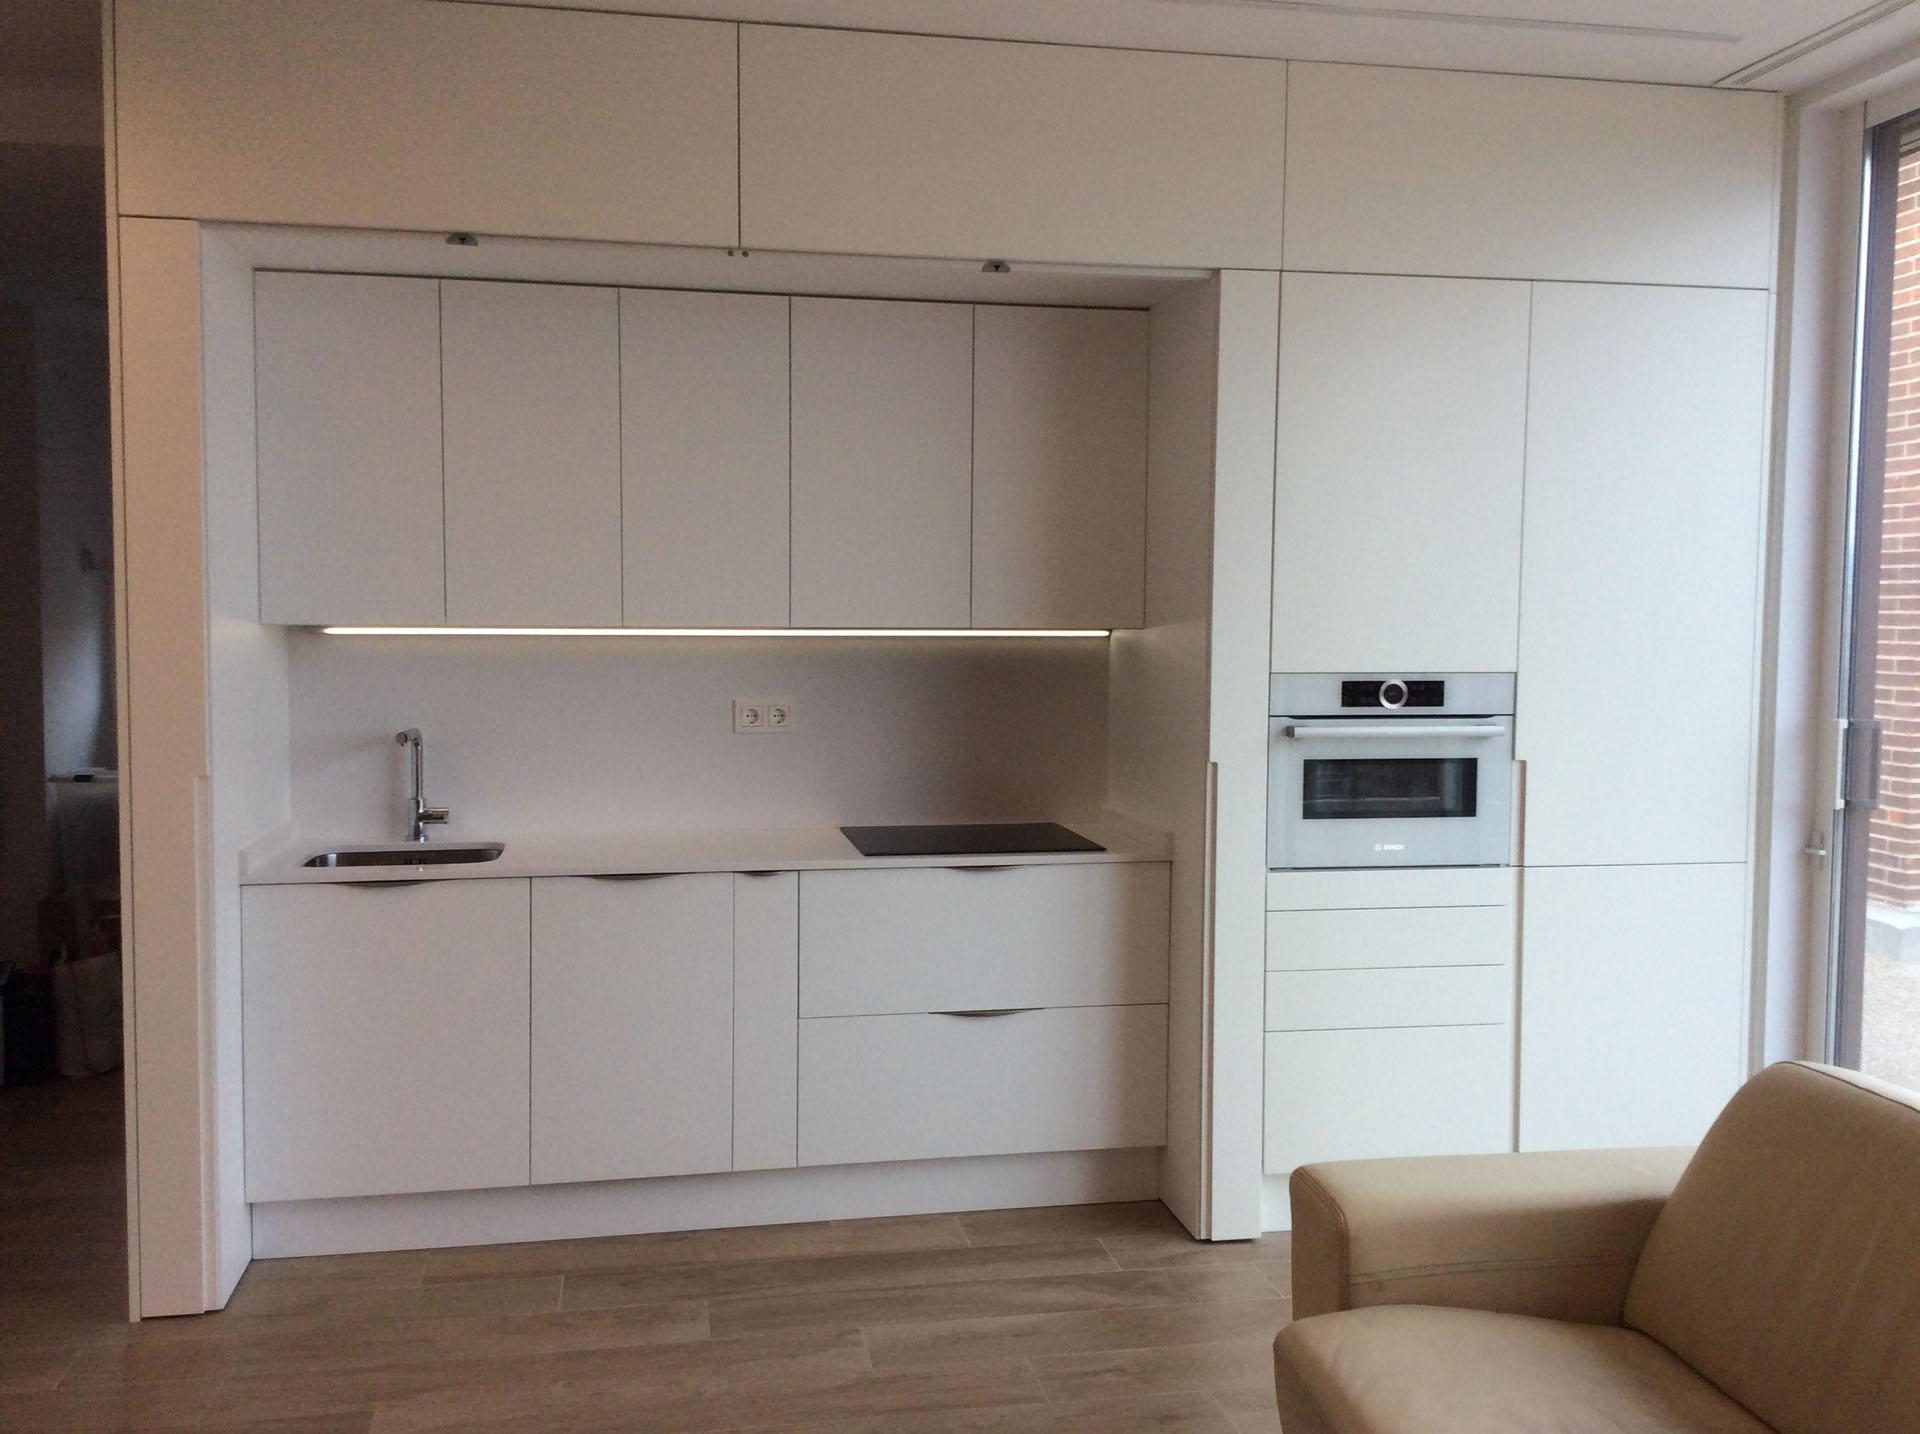 Cocina con puertas de ocultaci n escamoteables abiertas for Puertas para cocina